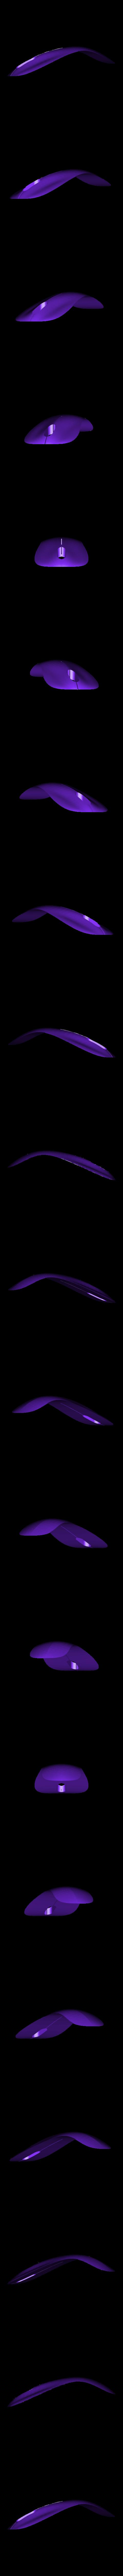 V3_mouse_top.STL Download free STL file Multi-Color Computer Mouse Model: Industrial/Product Design • 3D printable model, MosaicManufacturing